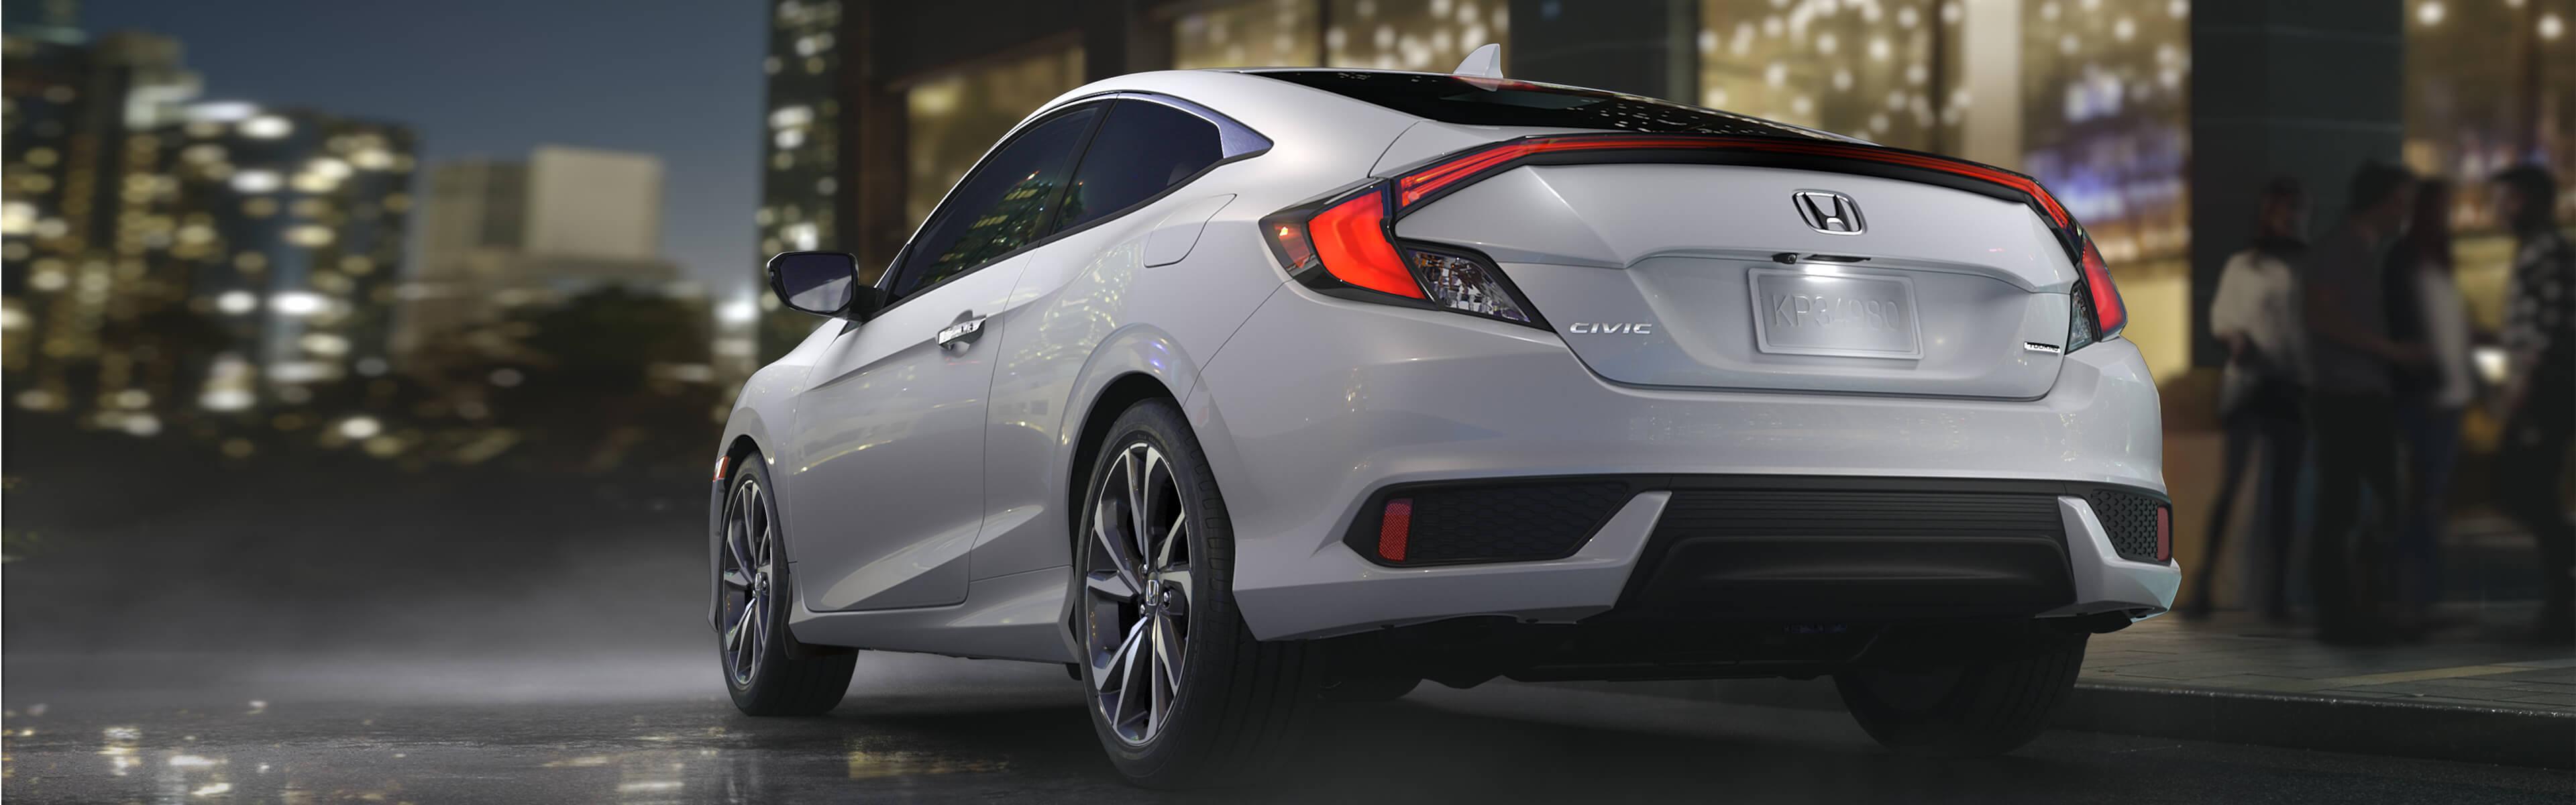 Le Coup 233 Civic 2019 Honda Canada